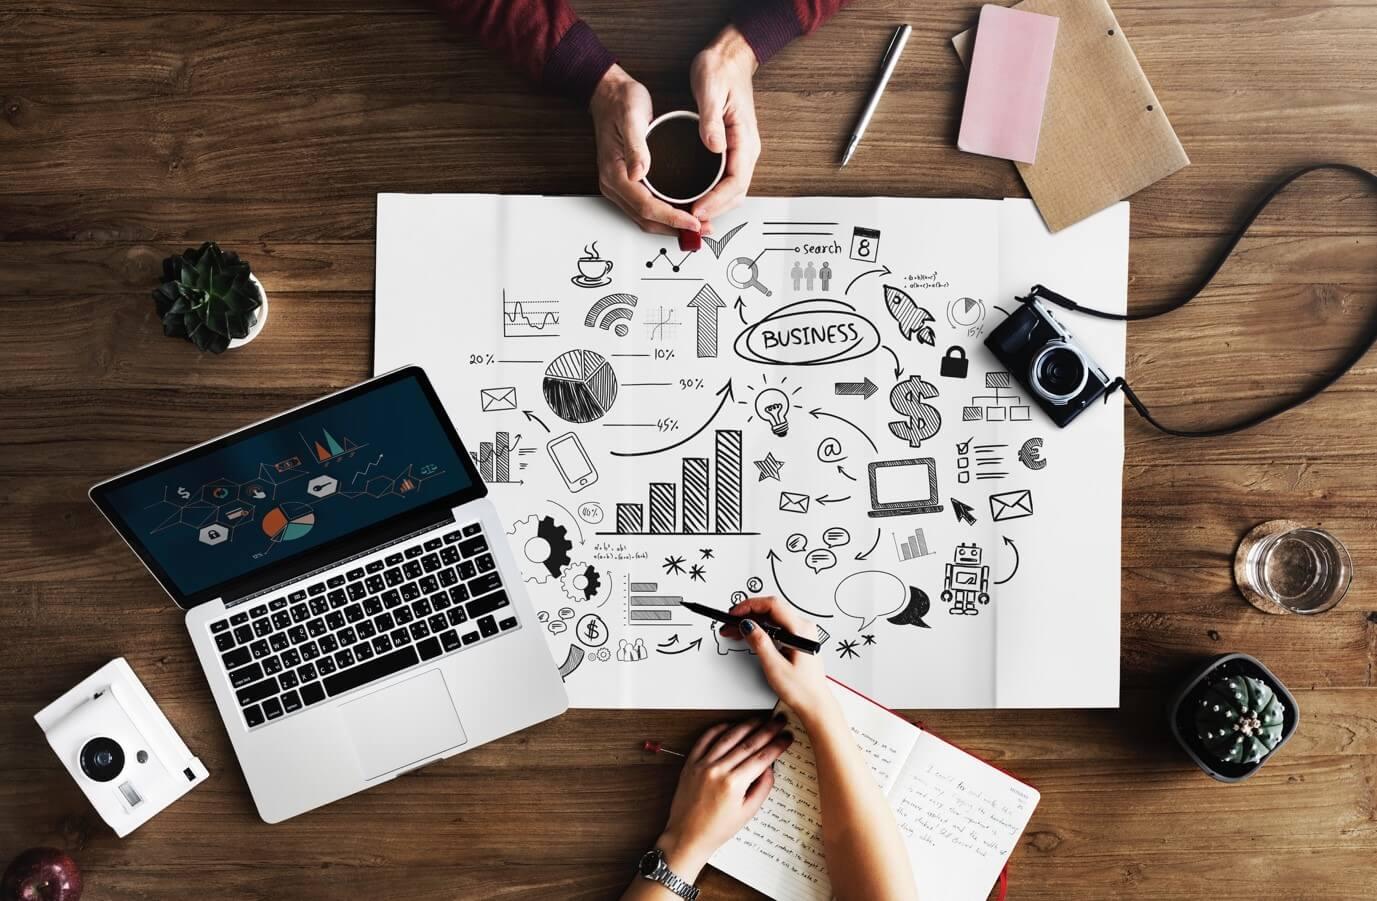 laptop business image